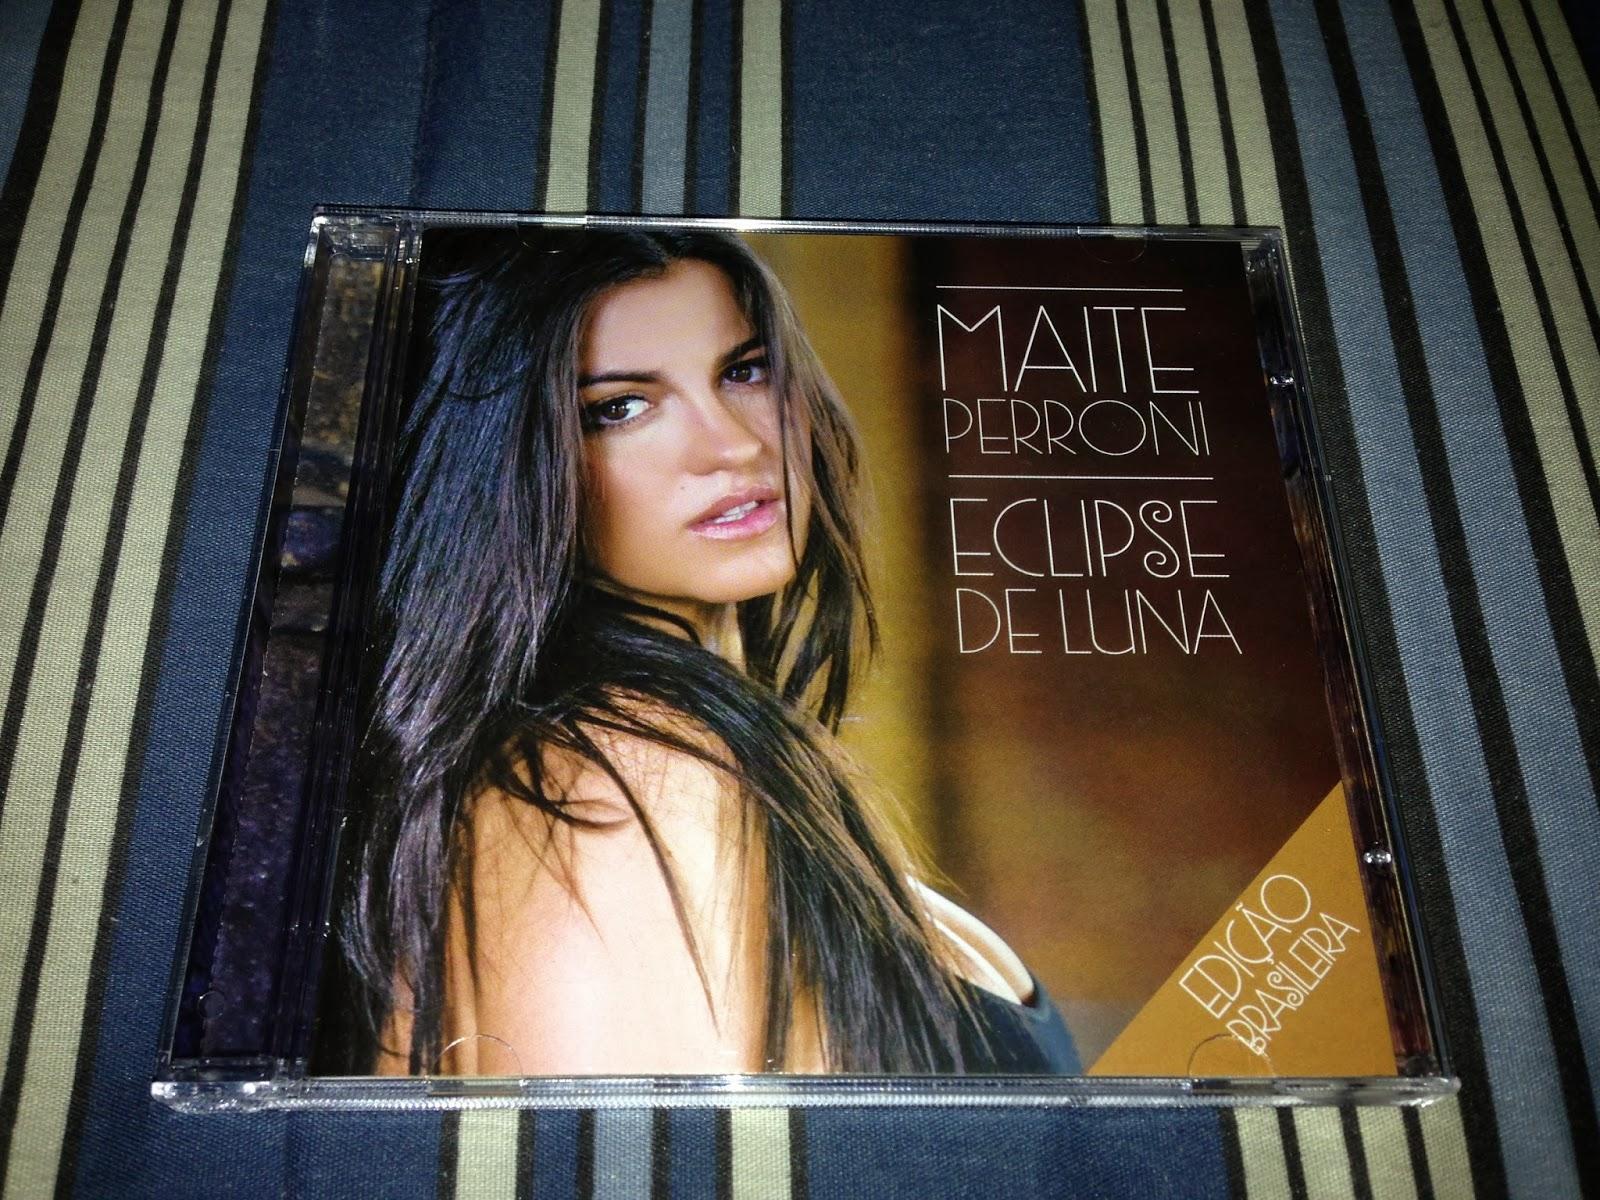 o cd de maite perroni eclipse de luna